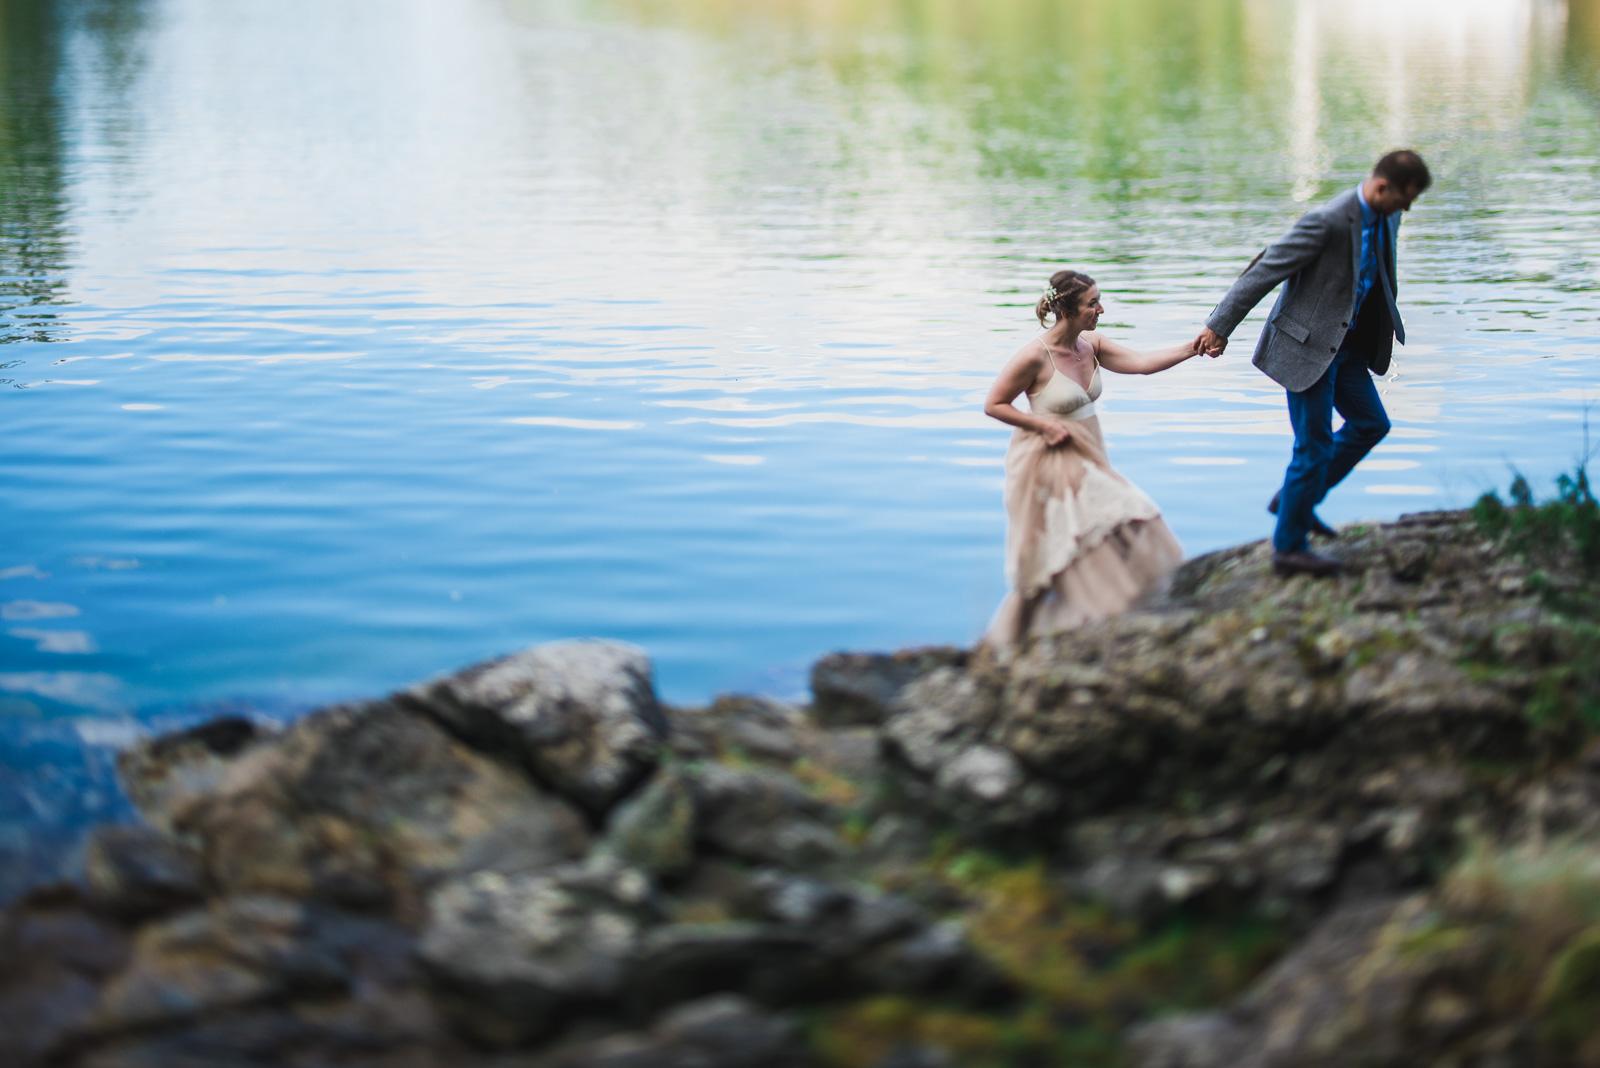 vancouver-island-wedding-photographers-cliff-gilker-park-smugglers-cove-elopement-34.jpg